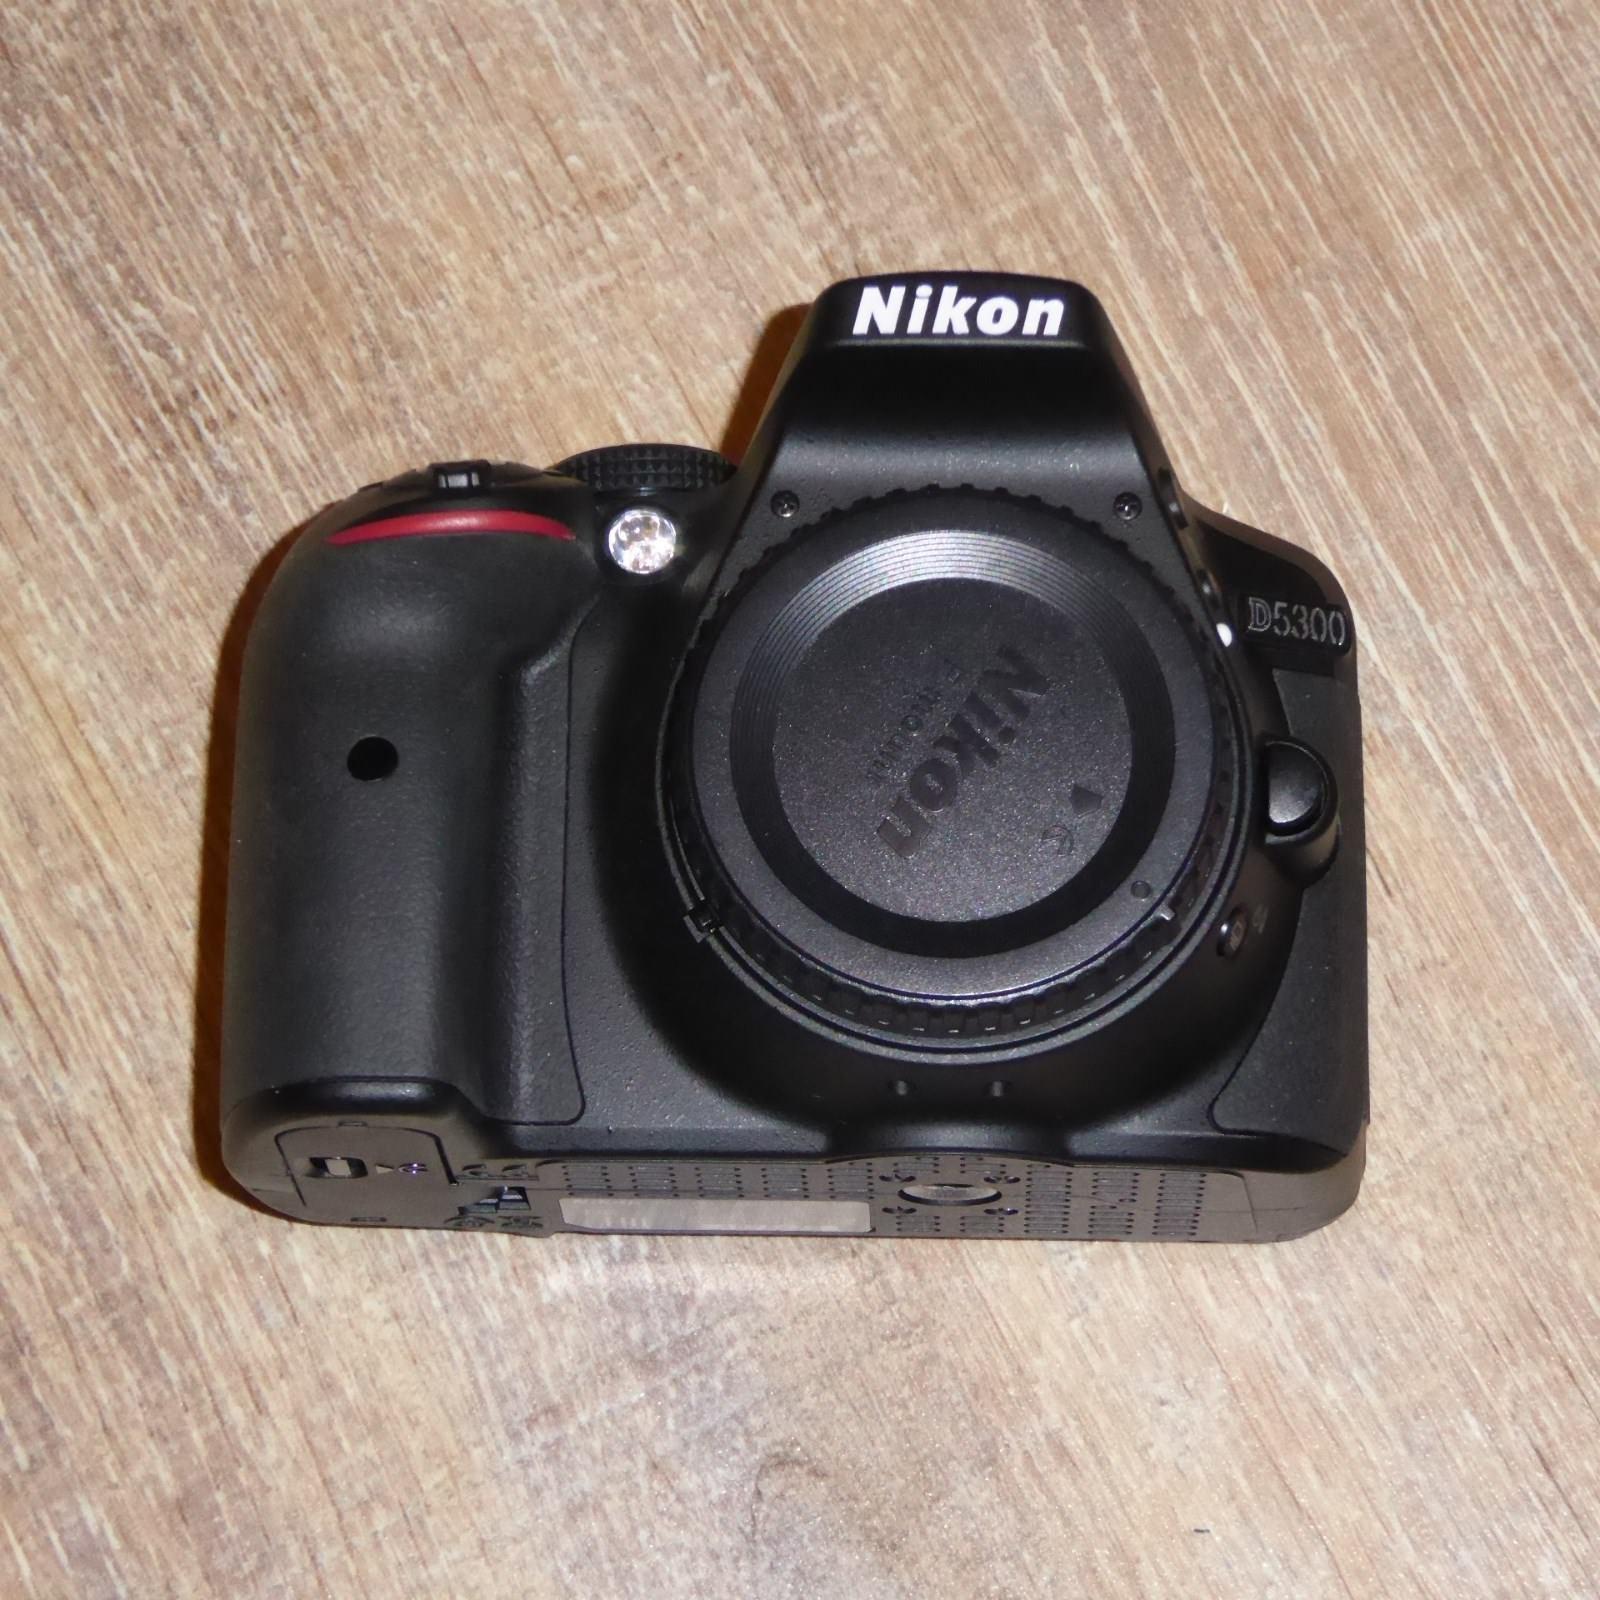 Nikon D D5300 24.2 MP DSLR Schwarz (Nur Gehäuse) 8 Monate alt 20 Clicks wie neu!